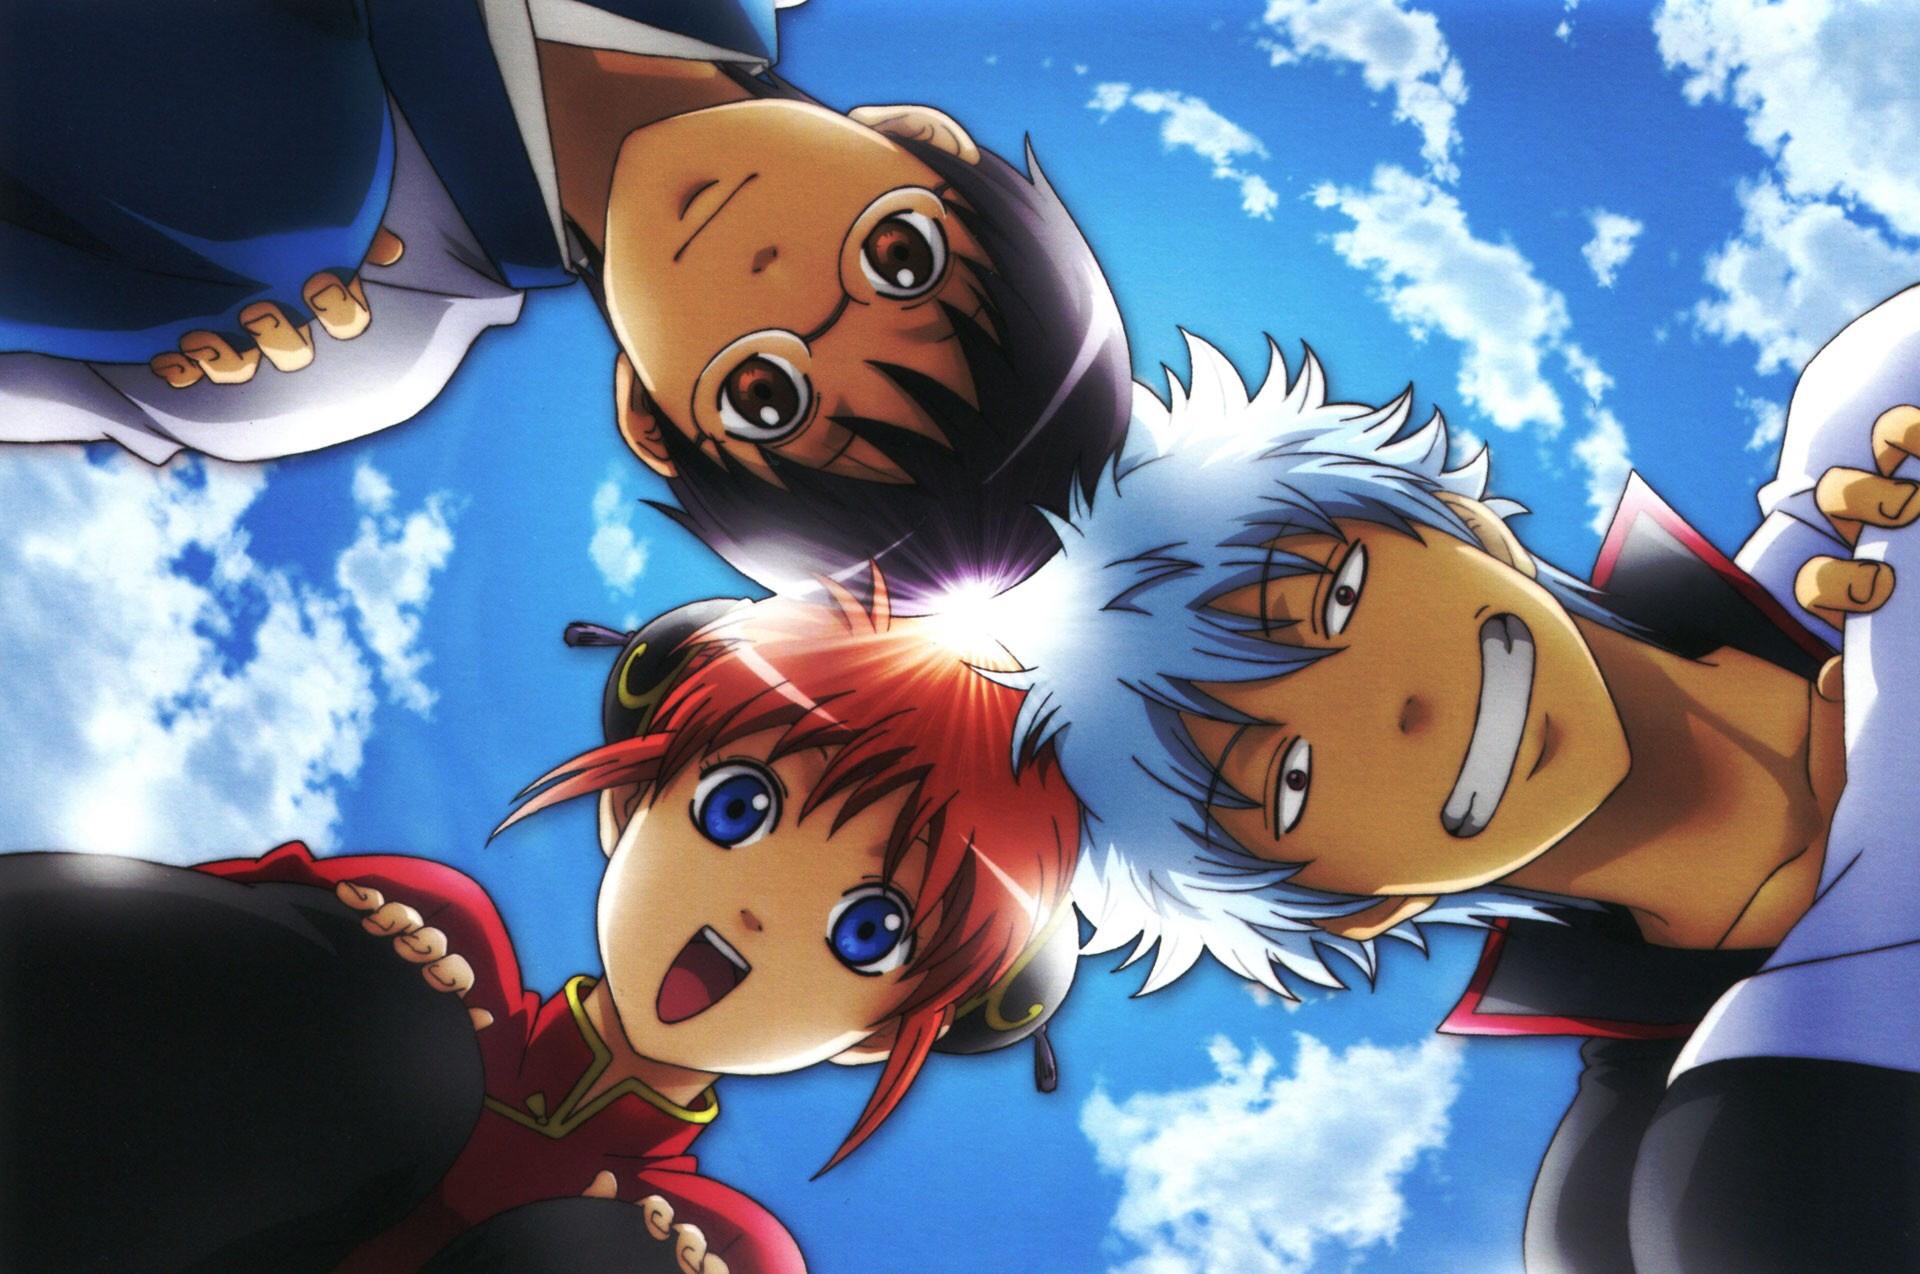 27+ Gintama Tsukuyo Episode Appearances Pictures